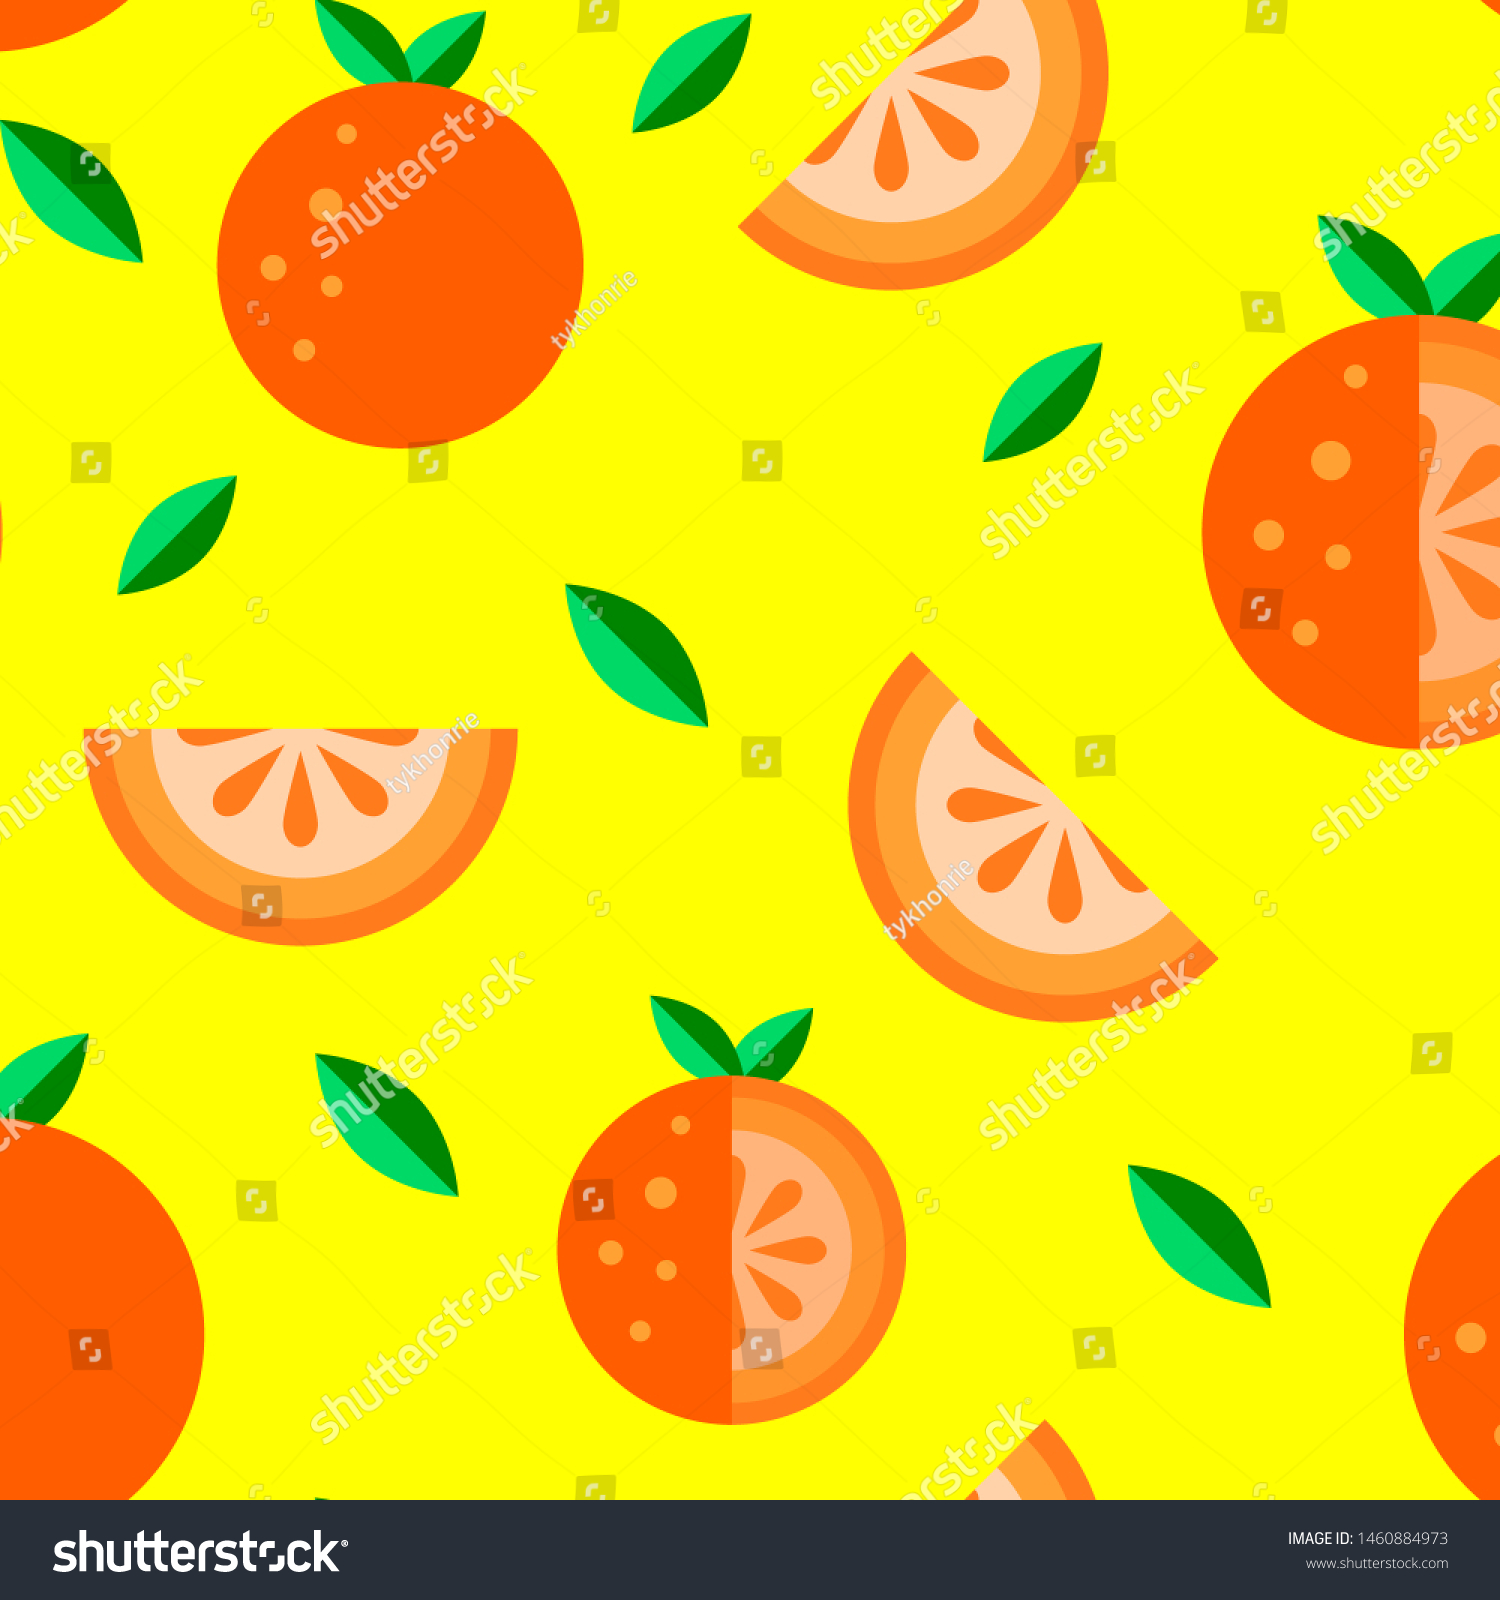 Orange Tangerine fruit flat icon Seamless Pattern set yellow background. Cartoon summer food cute kawaii style. Funny doodle illustration. Whole slice,half fresh healthy fruits logo t shirt kids print